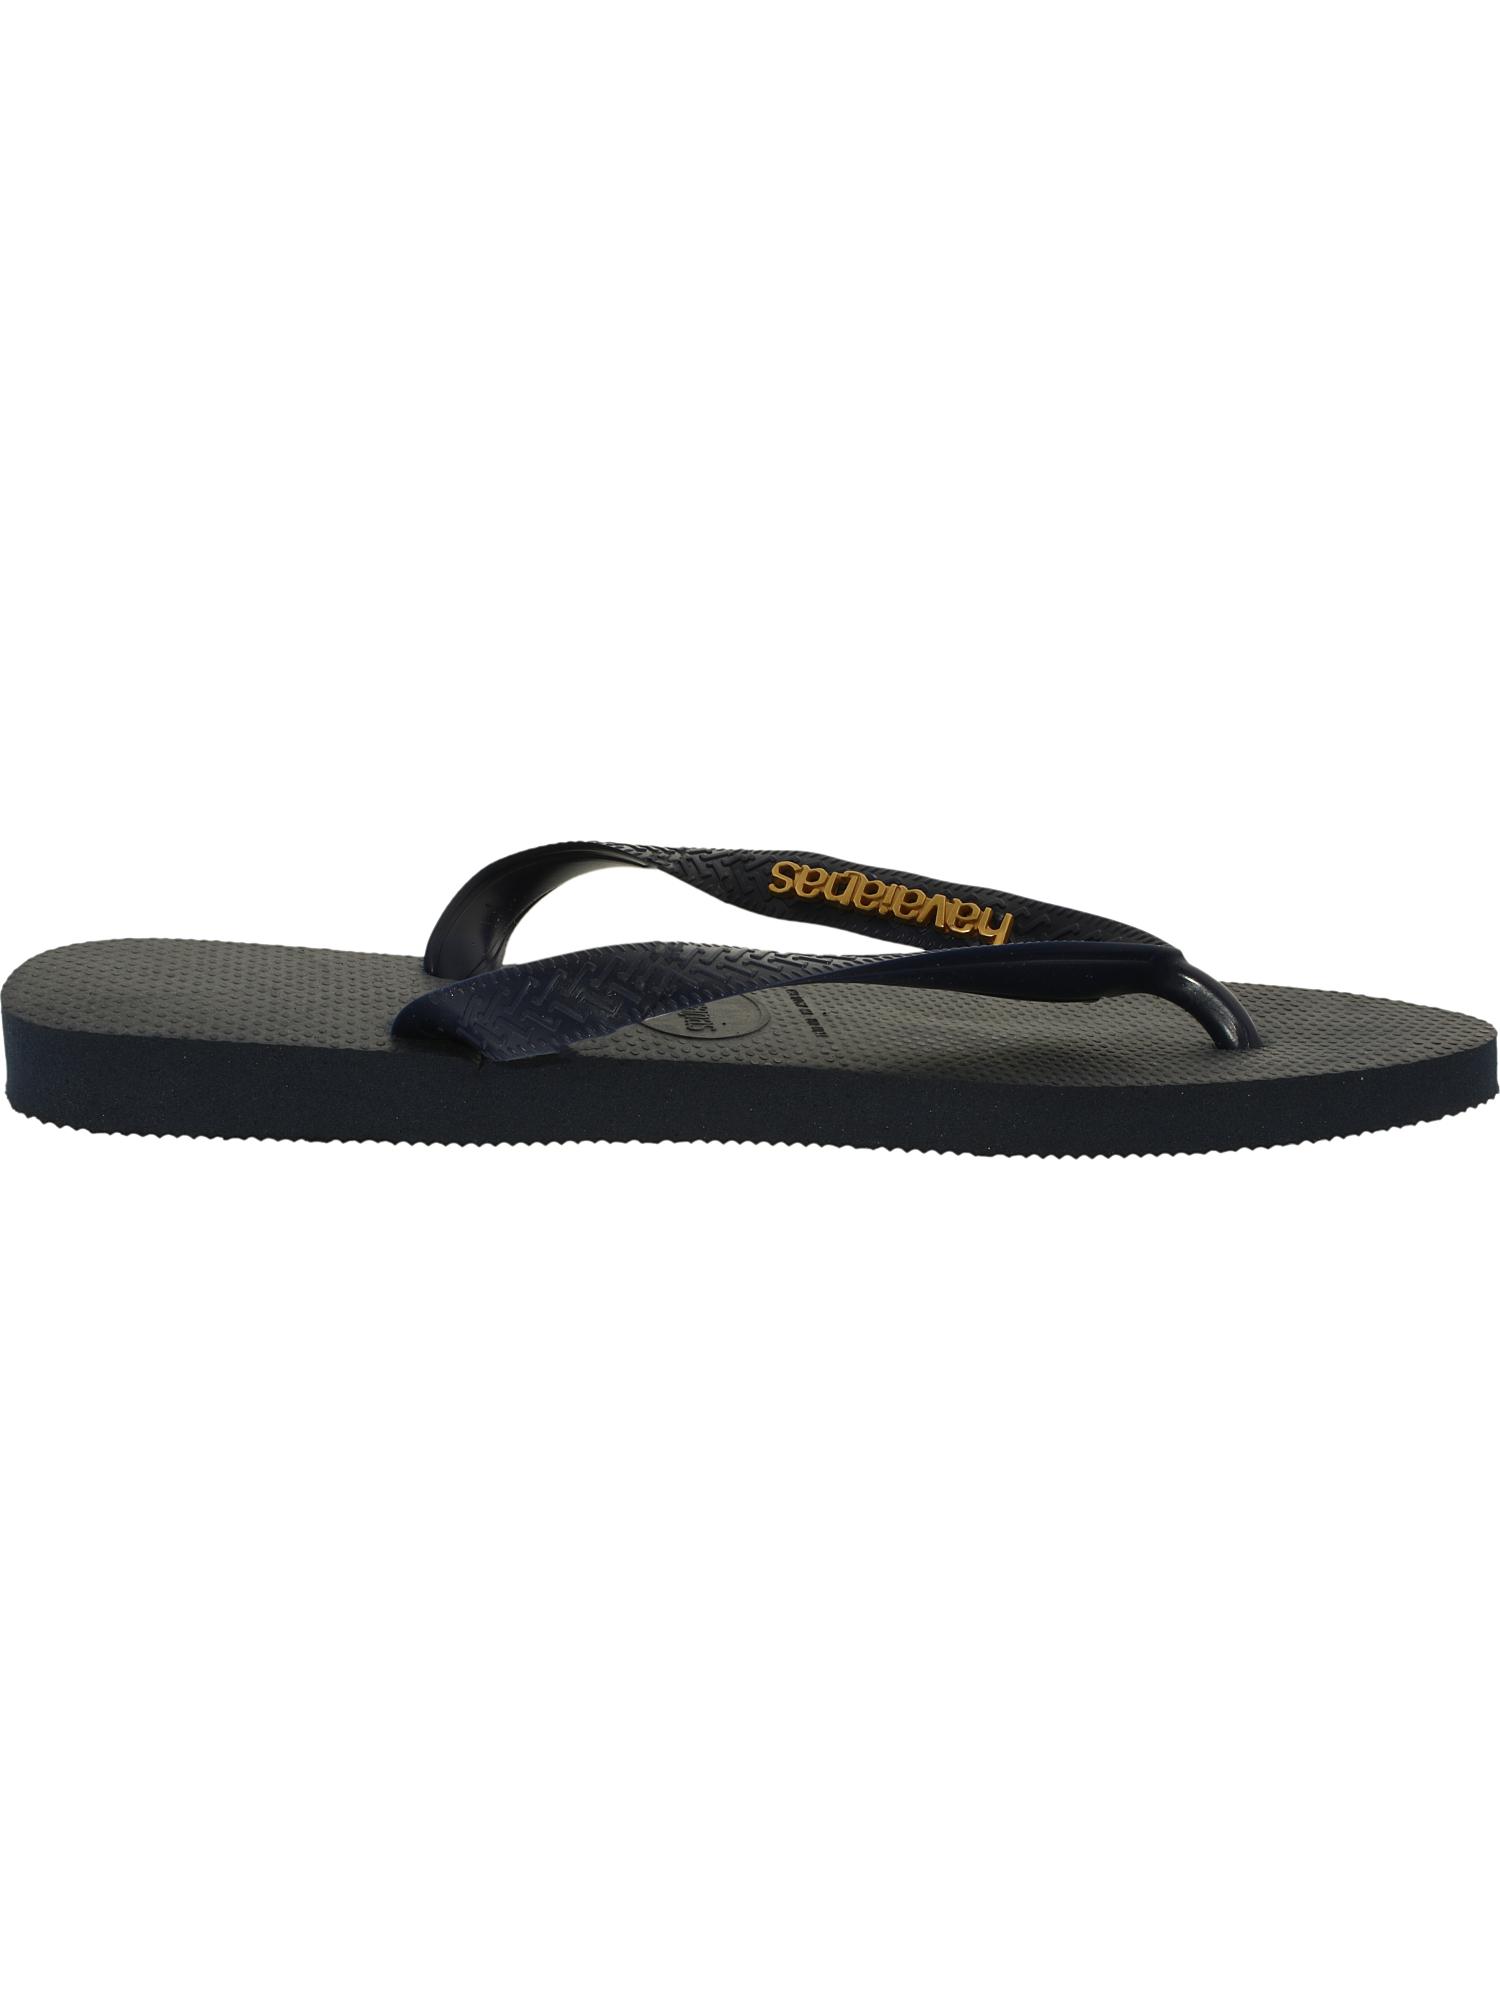 Havaianas-Women-039-s-H-L-Metallic-Rubber-Sandal thumbnail 5